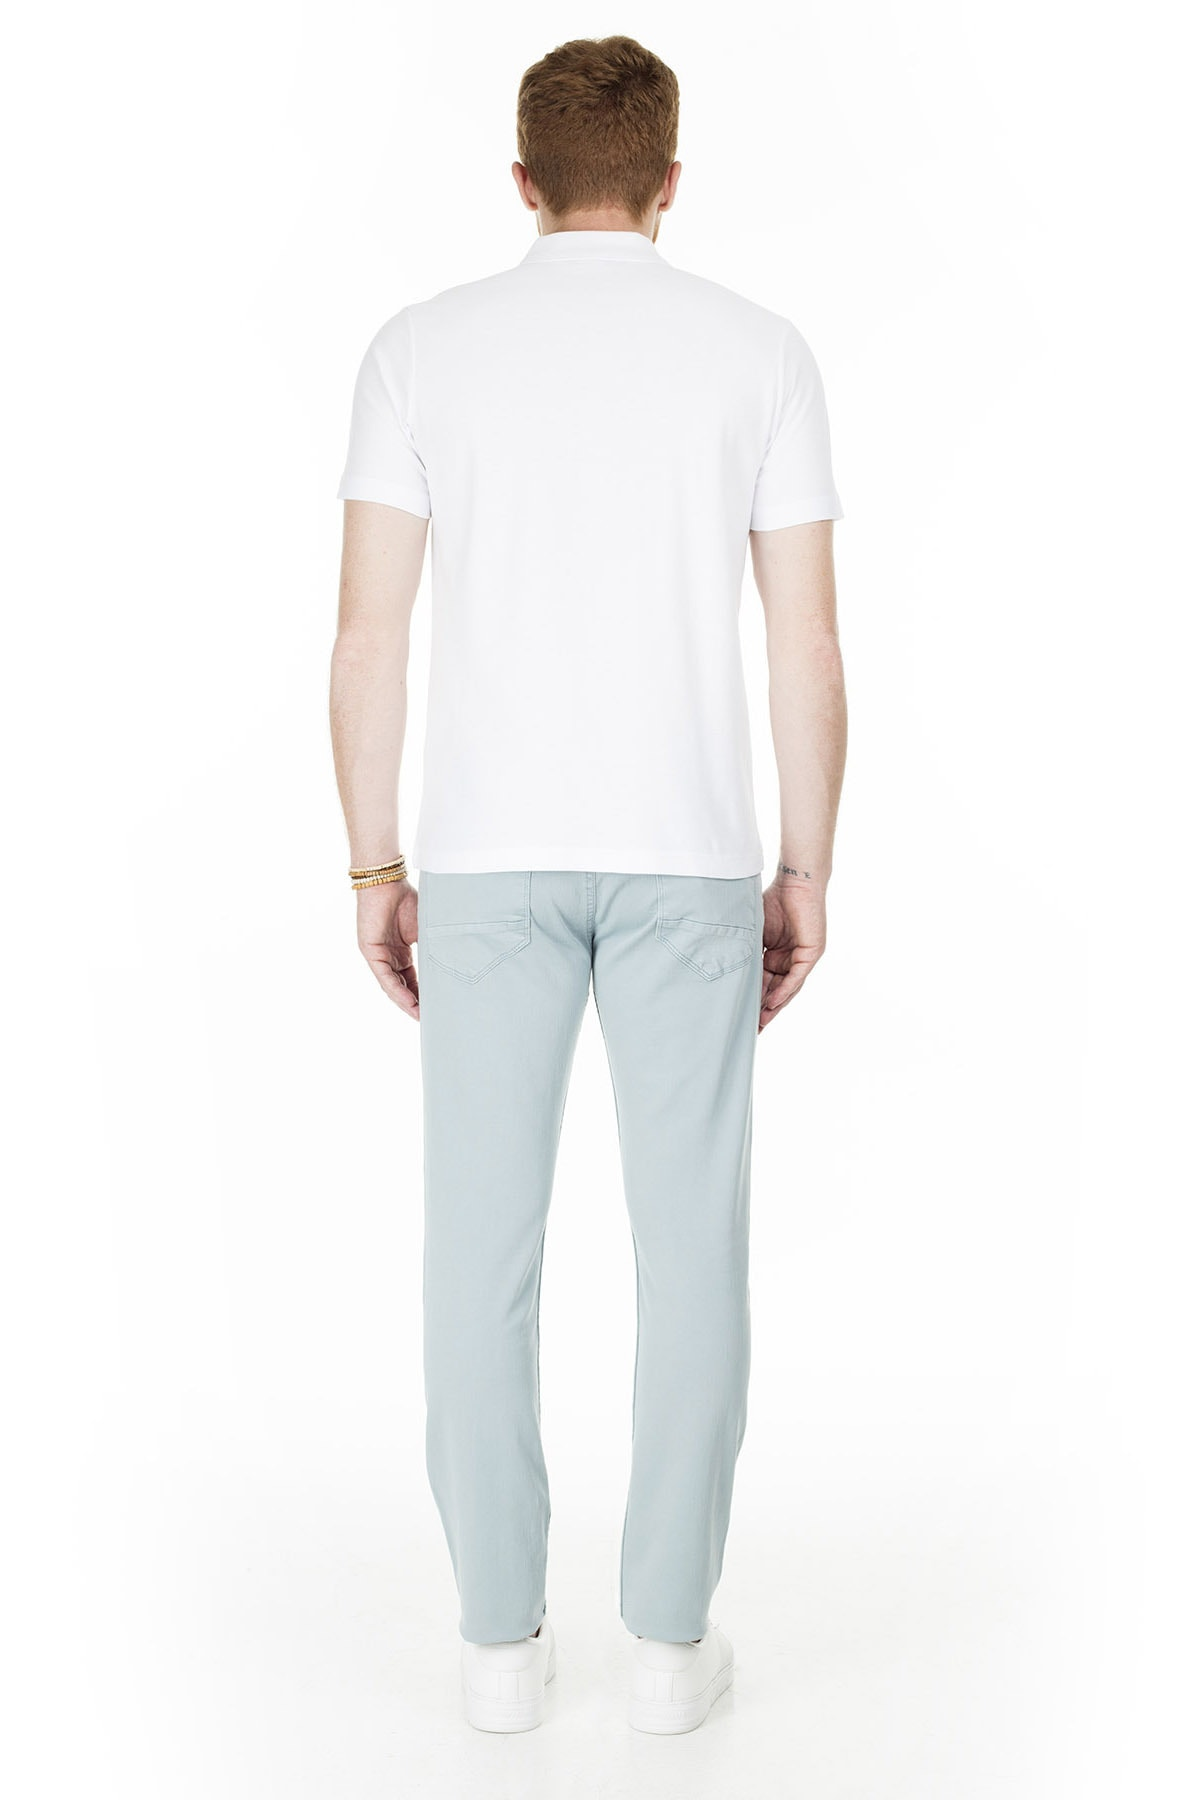 Buratti Erkek AÇIK MAVİ Normal Bel Dar Paça Slim Fit Jeans Pamuklu Kot Pantolon 7299F0287ARTOS 4